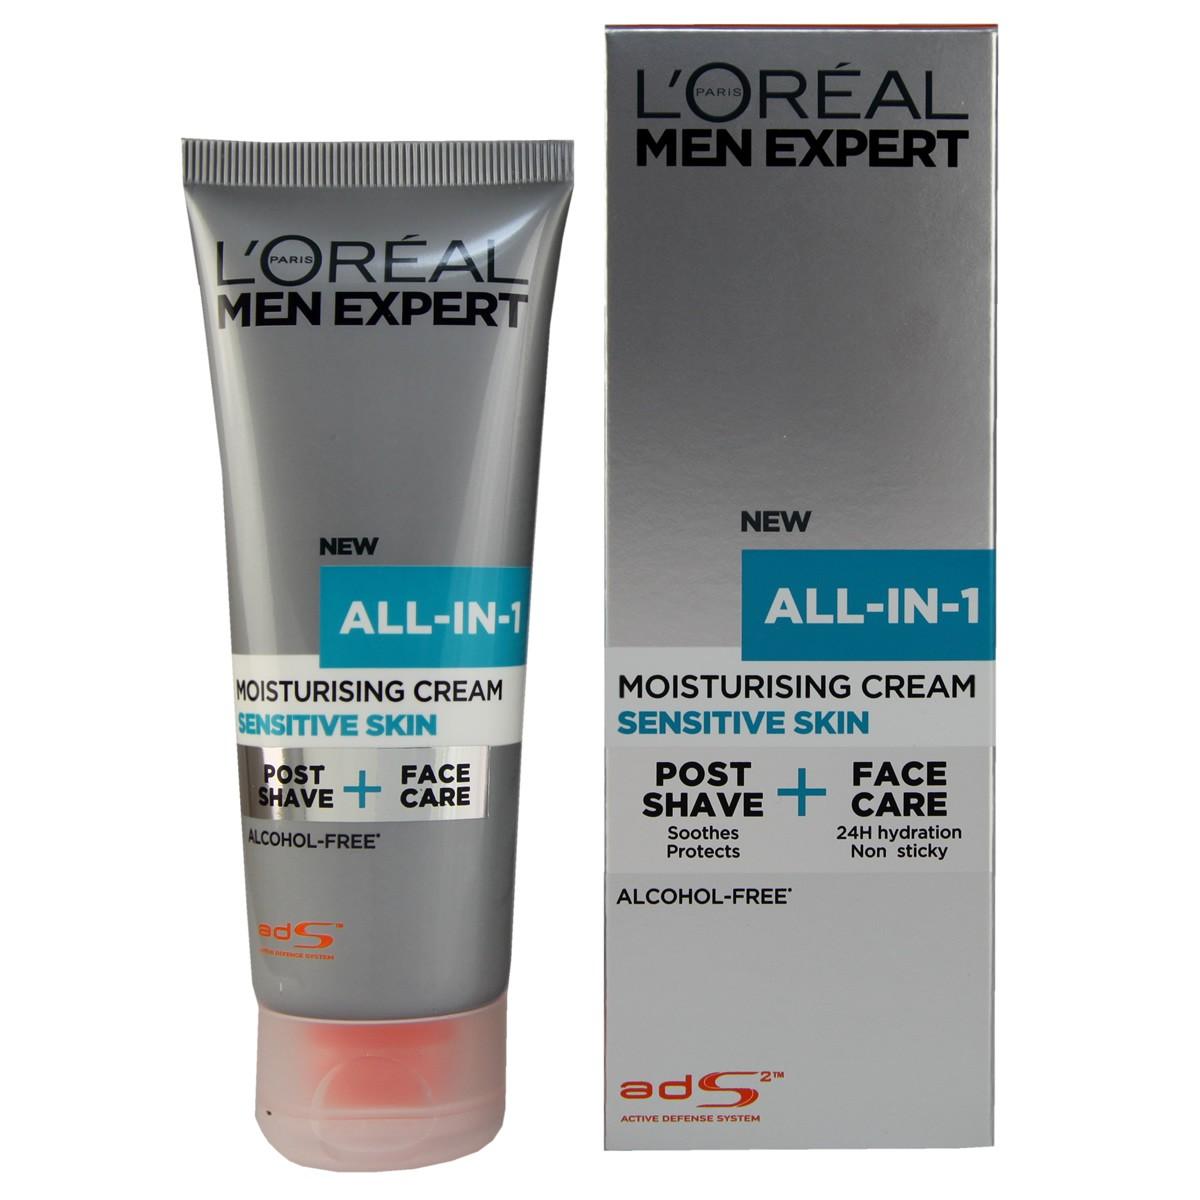 L'Oreal Paris Men Expert All-In-One Moisturising Cream - Sensitive Skin